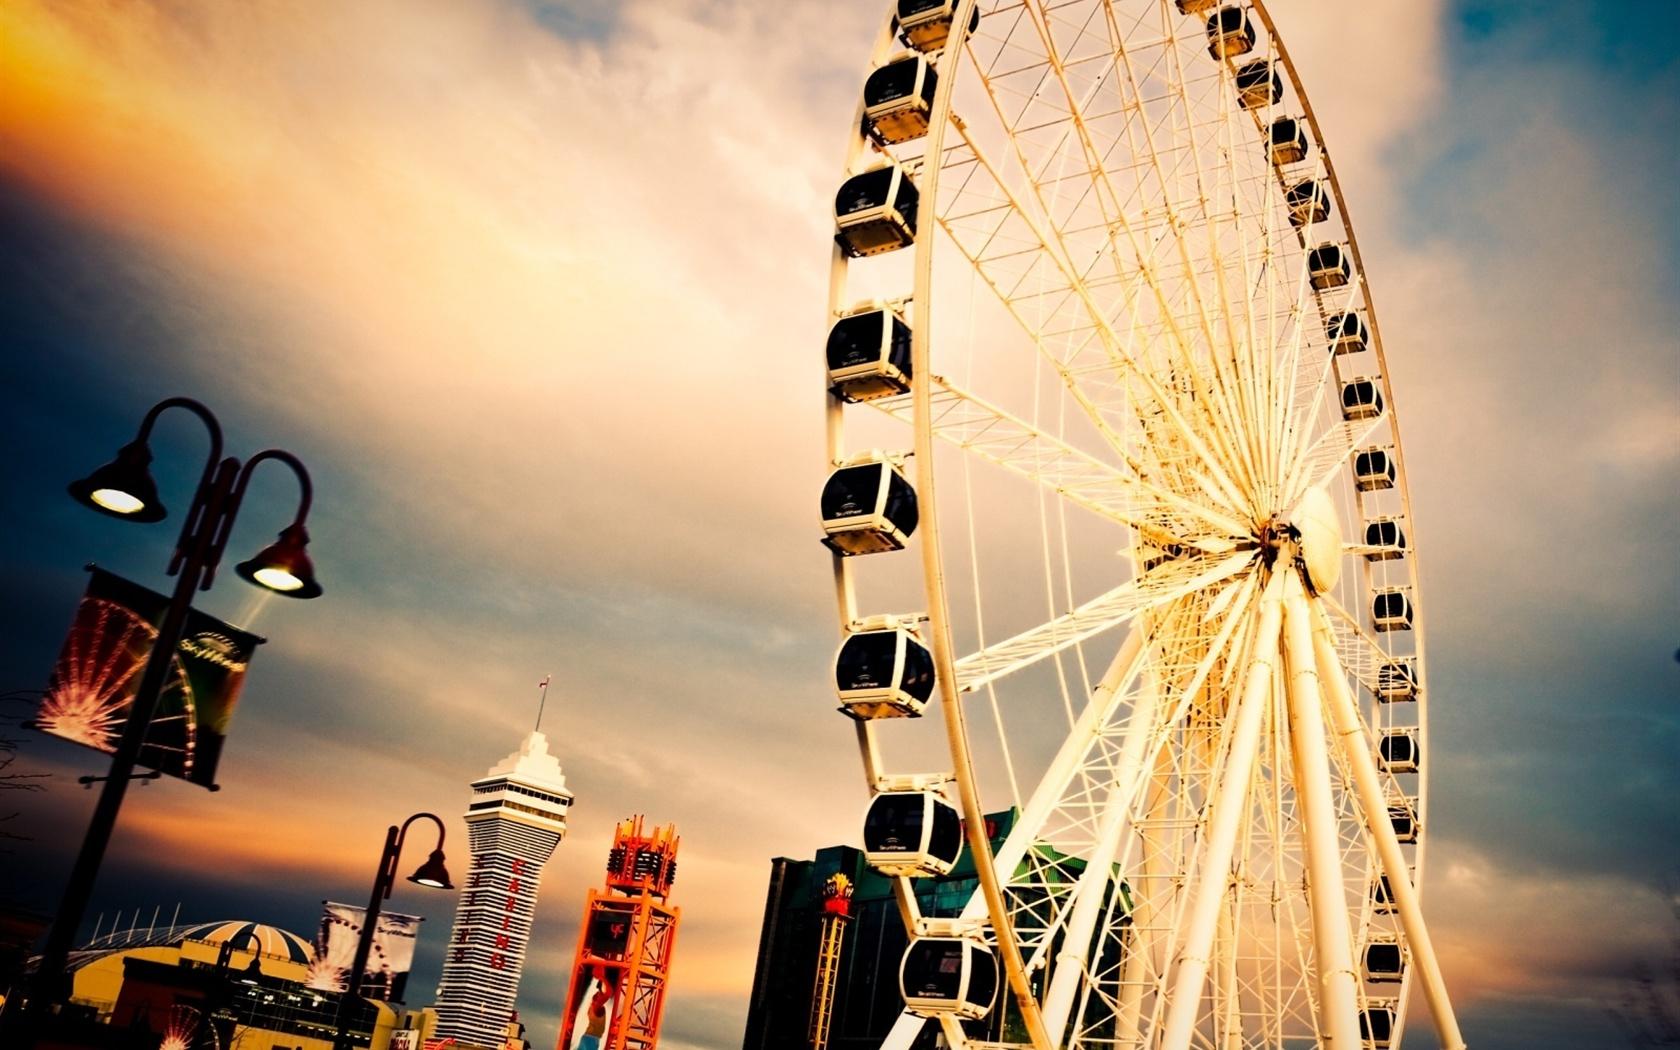 City Ferris wheel wallpaper 1680x1050.